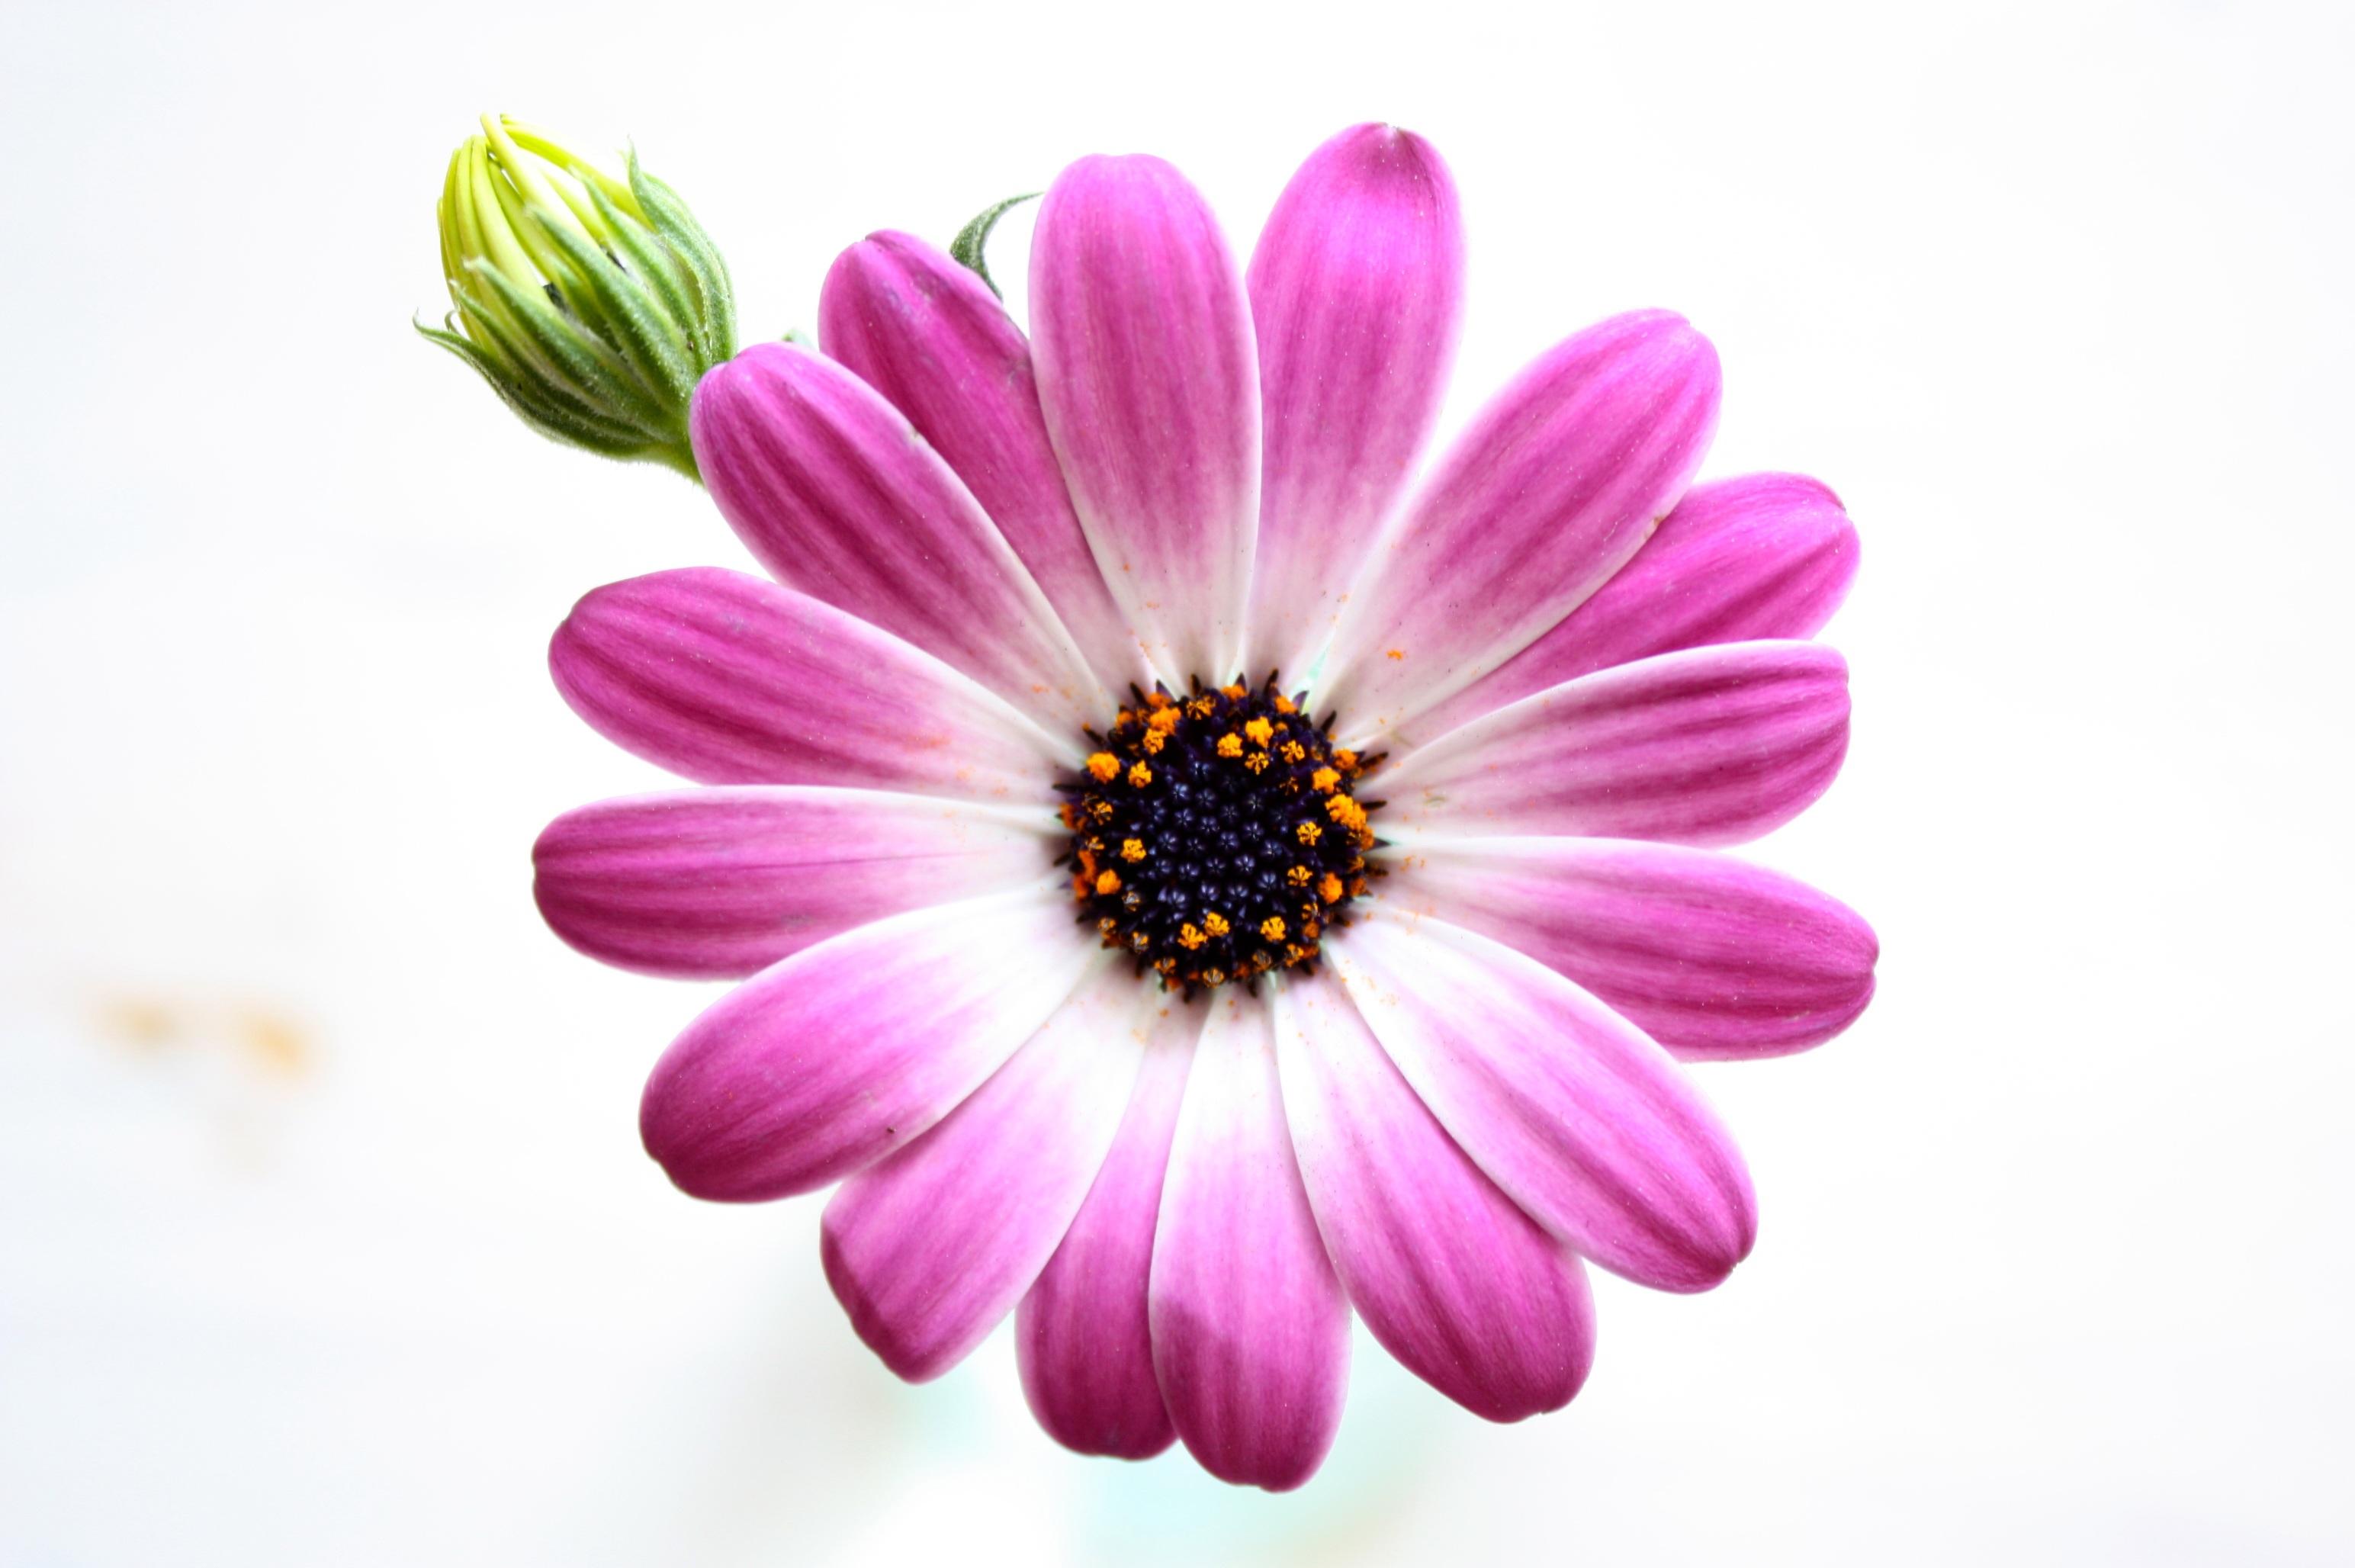 Free Images Nature Blossom Sun Flower Purple Petal Bloom